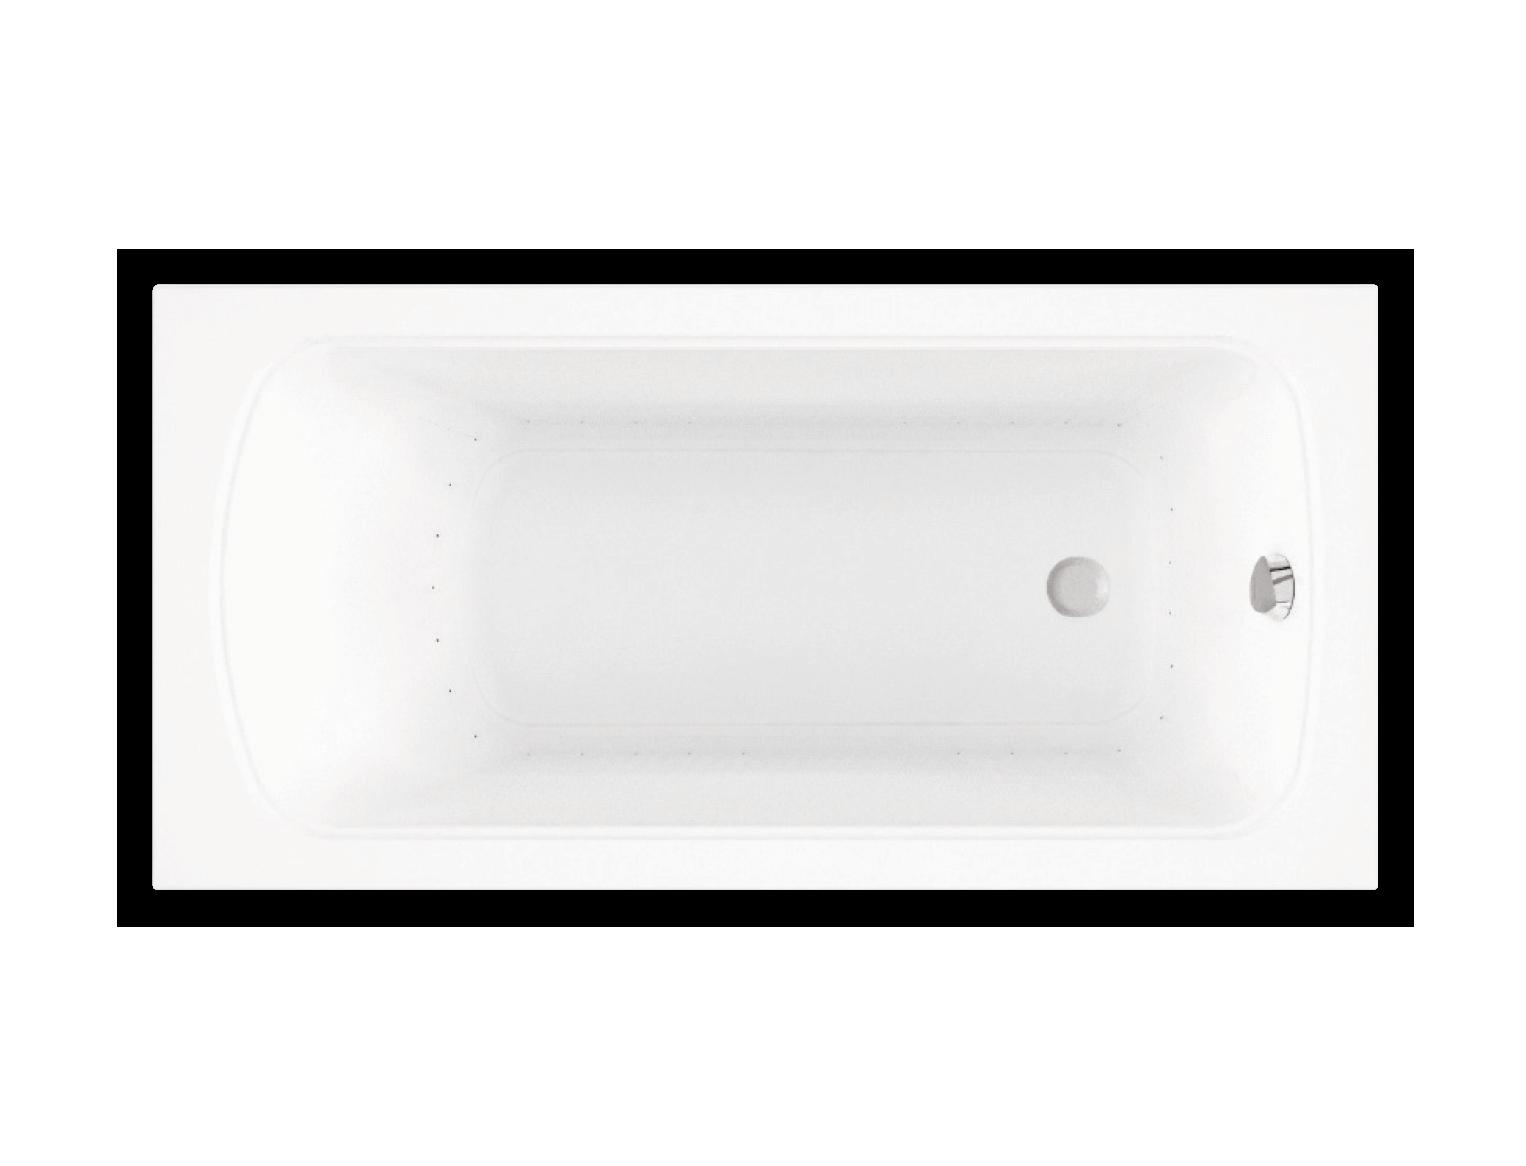 Bainultra Meridian® collection freestanding alcove air jet bathtub for your modern bathroom